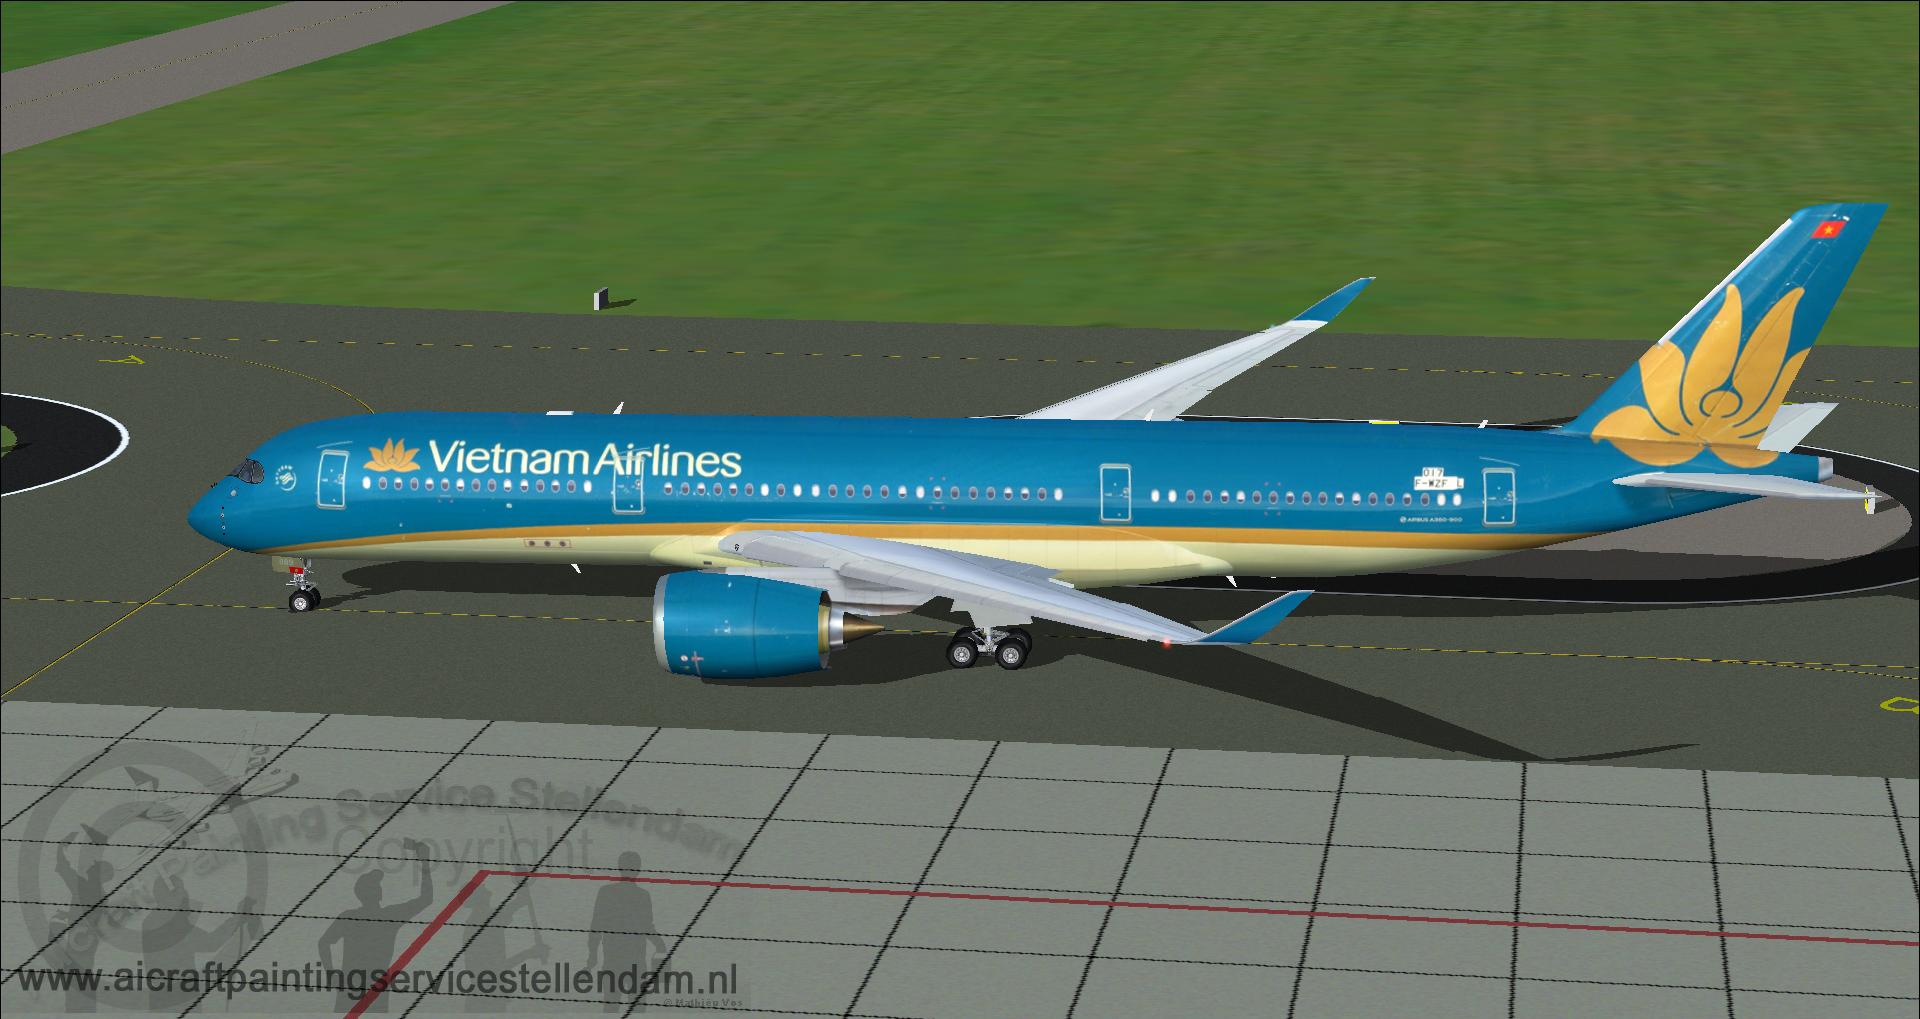 FSP_AirbusA350-941XWB_VietnamAirlines_VN-A889_F-WZFL_FS9